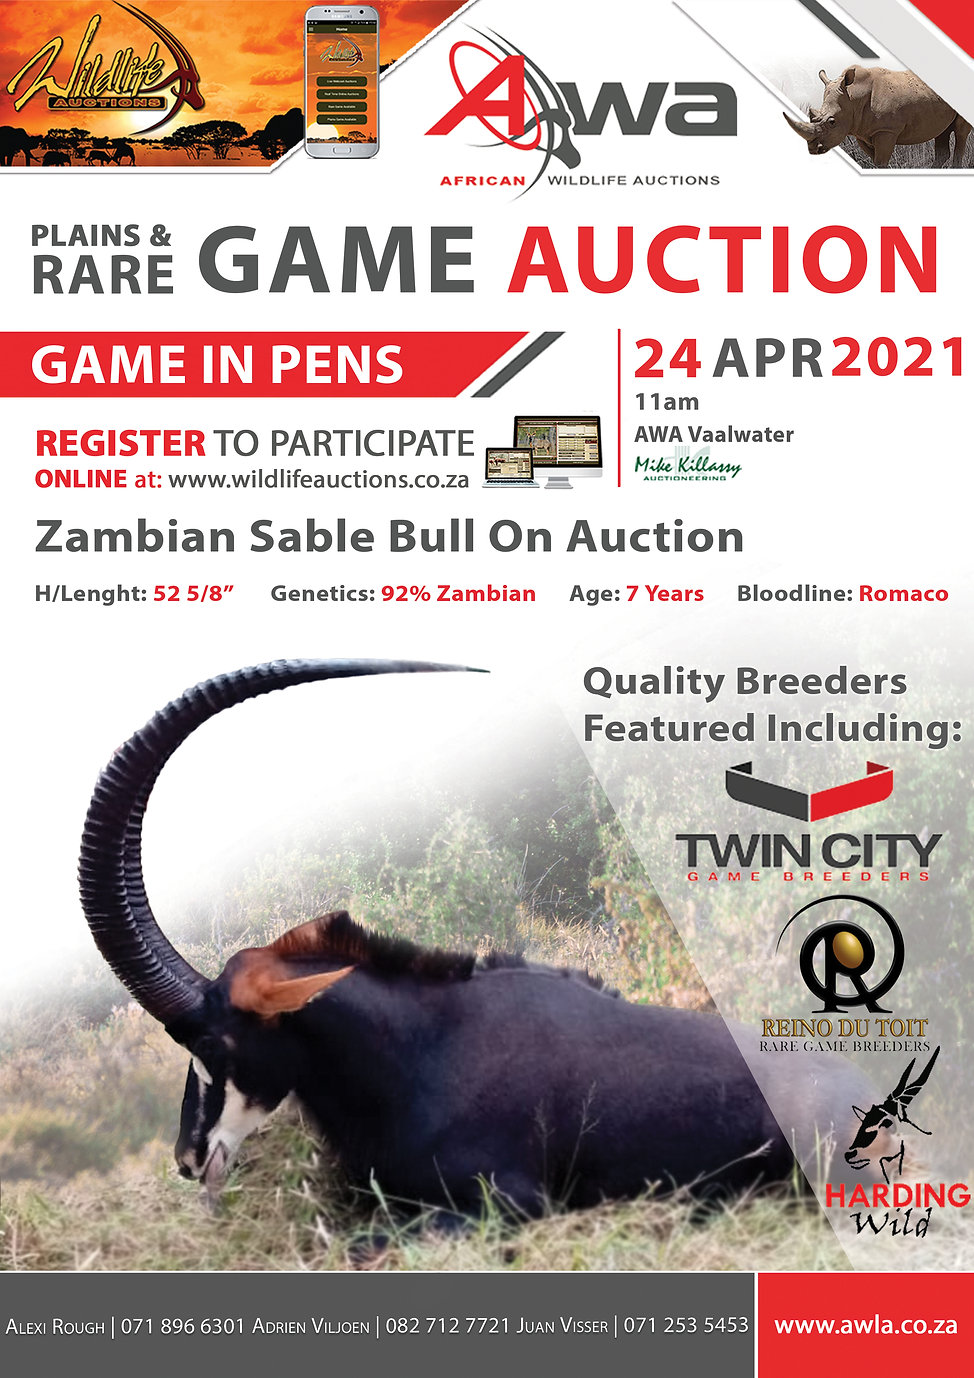 Backpage Cata Wildlife 10 April.jpg